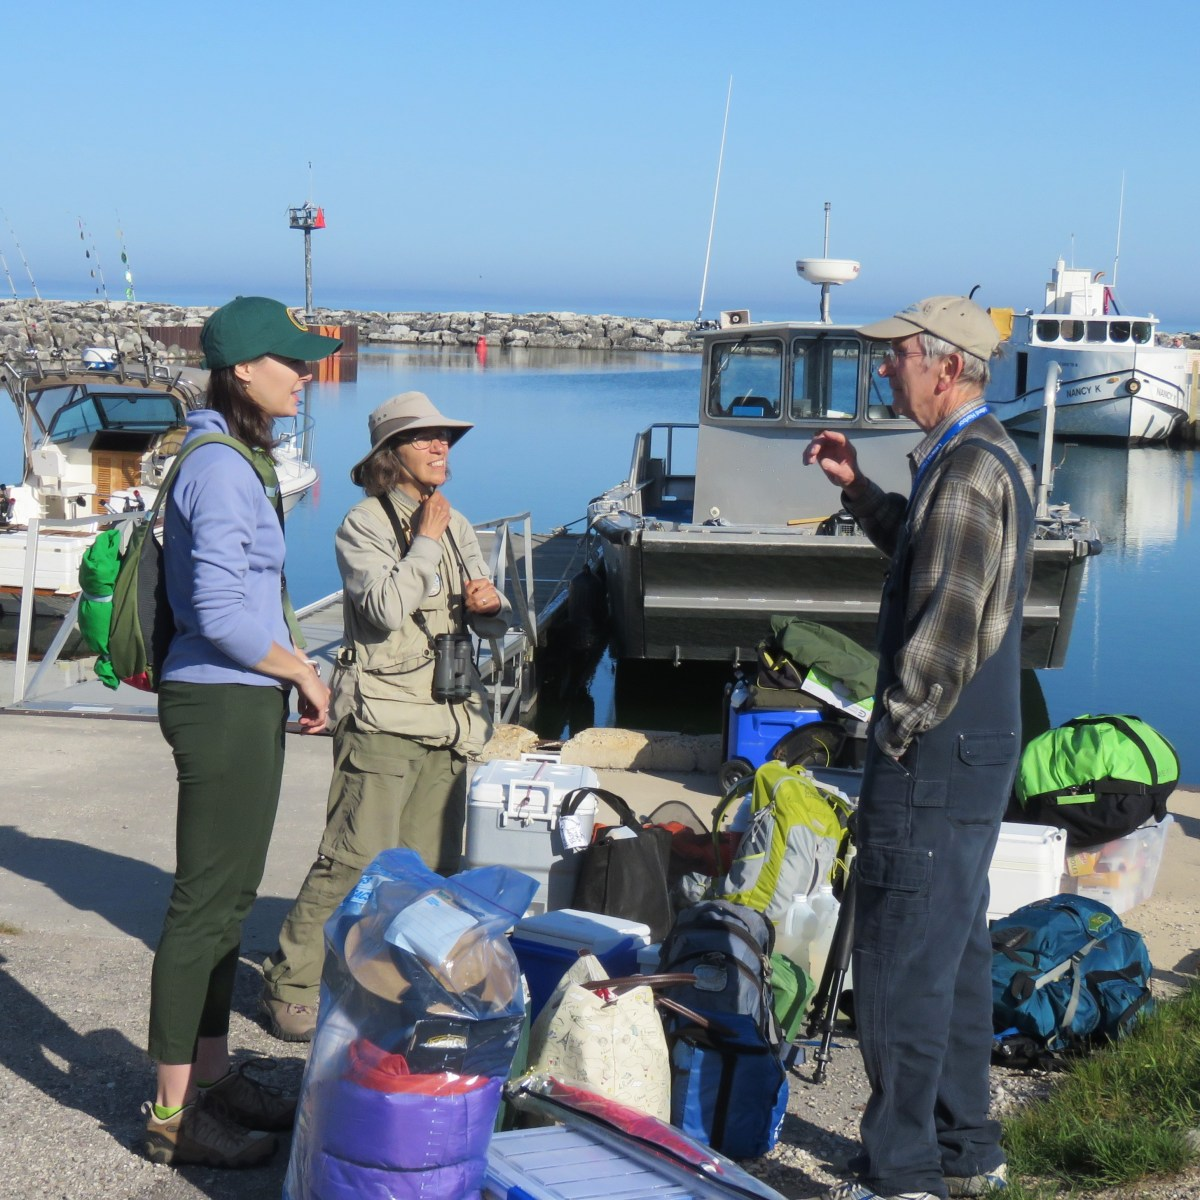 People talking at a fishtown breakwall